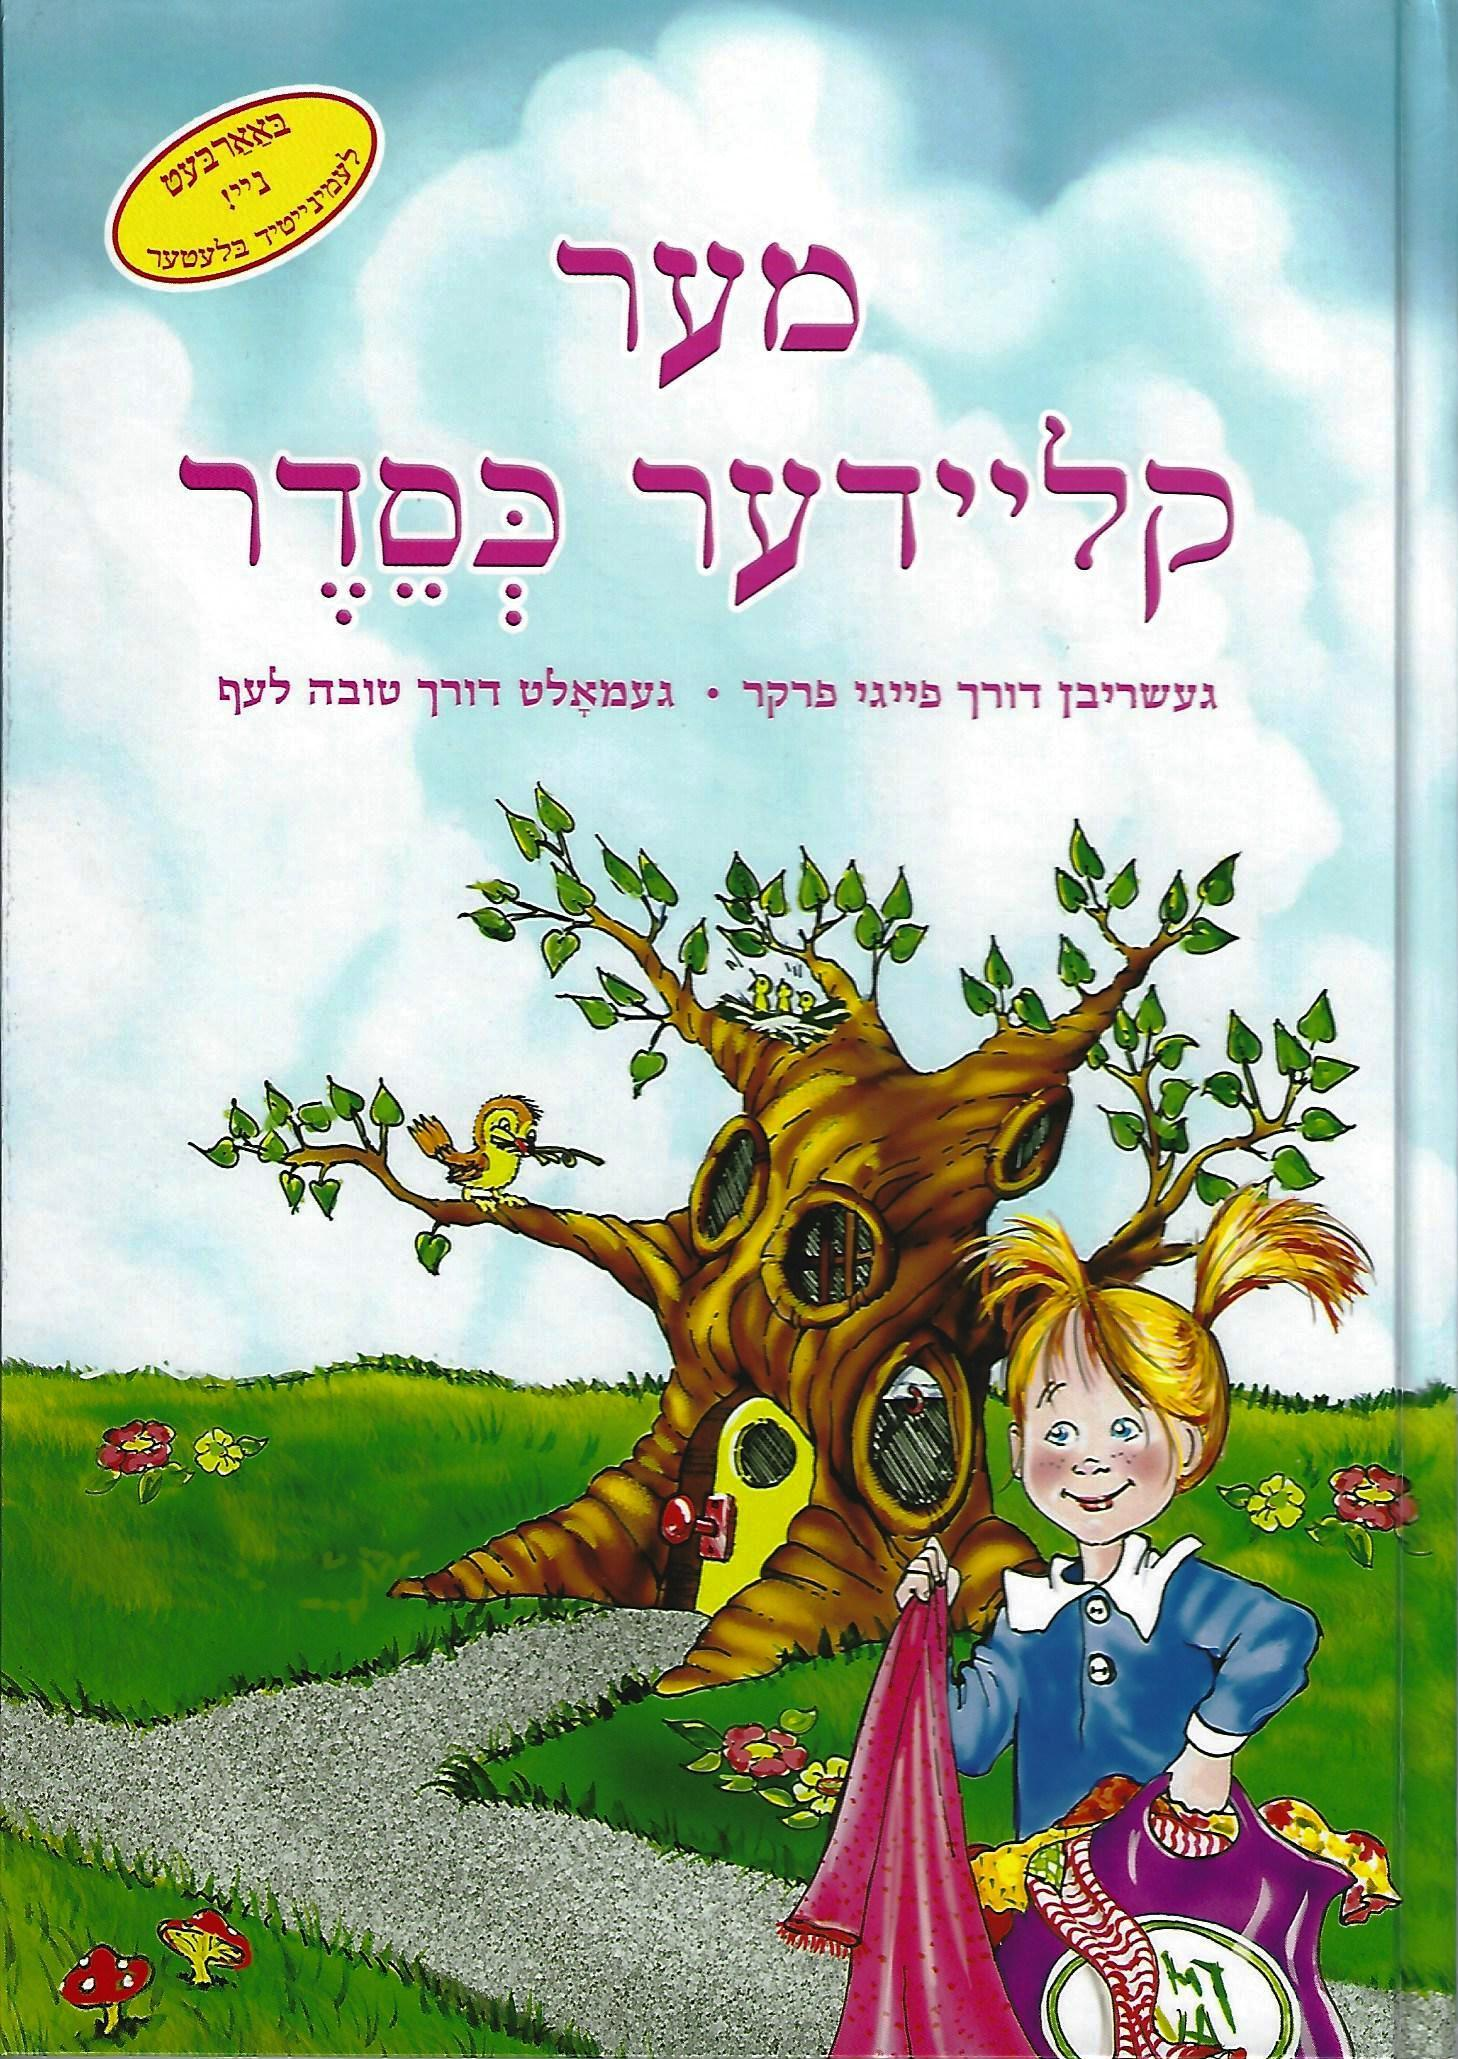 Messes Of Dresses – Yiddish